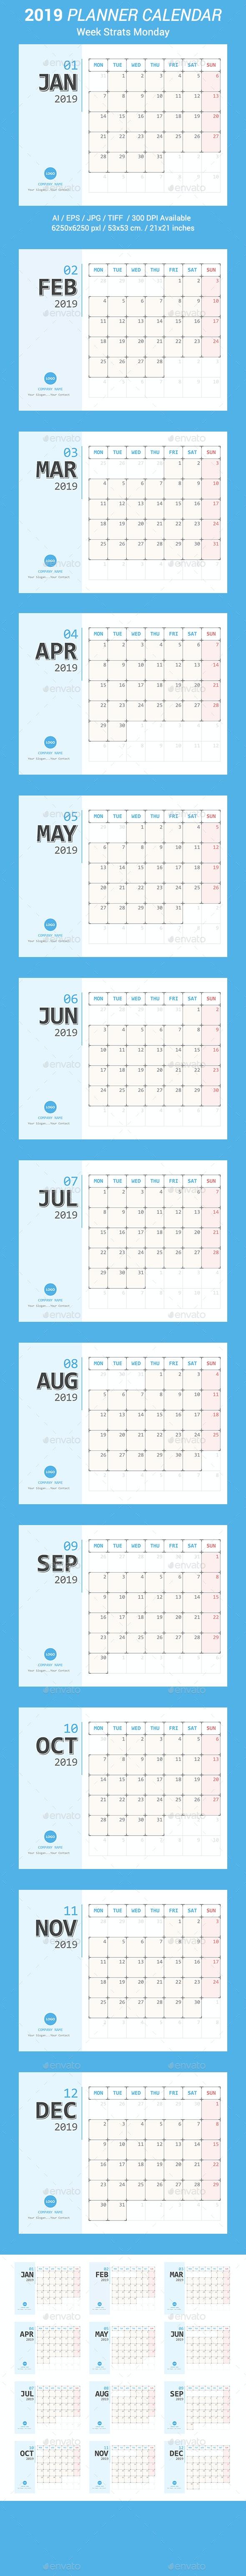 Calendar 2019 Planner Design. Week Starts Monday. - Calendars Stationery